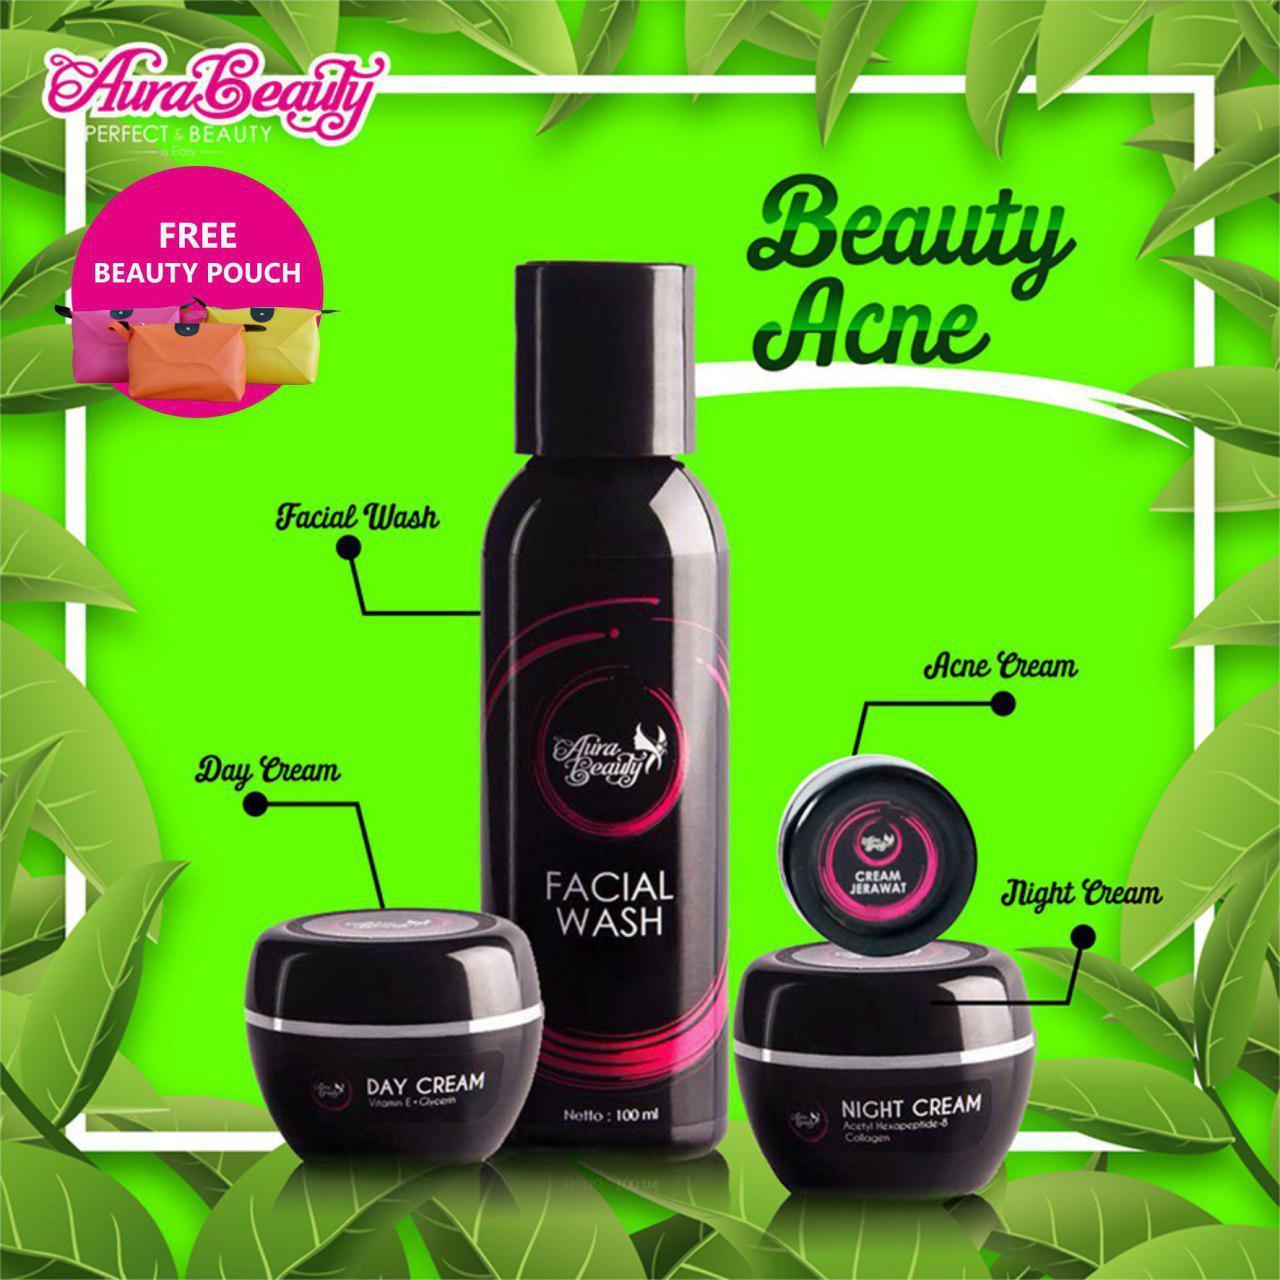 Harga Lipstik Aurabeauty Terbaik Aura Beauty Lipmatte Viola Best Seller Lipstick Matte Paket Acne Non Serum Cream Wajah Pemutih Pencerah